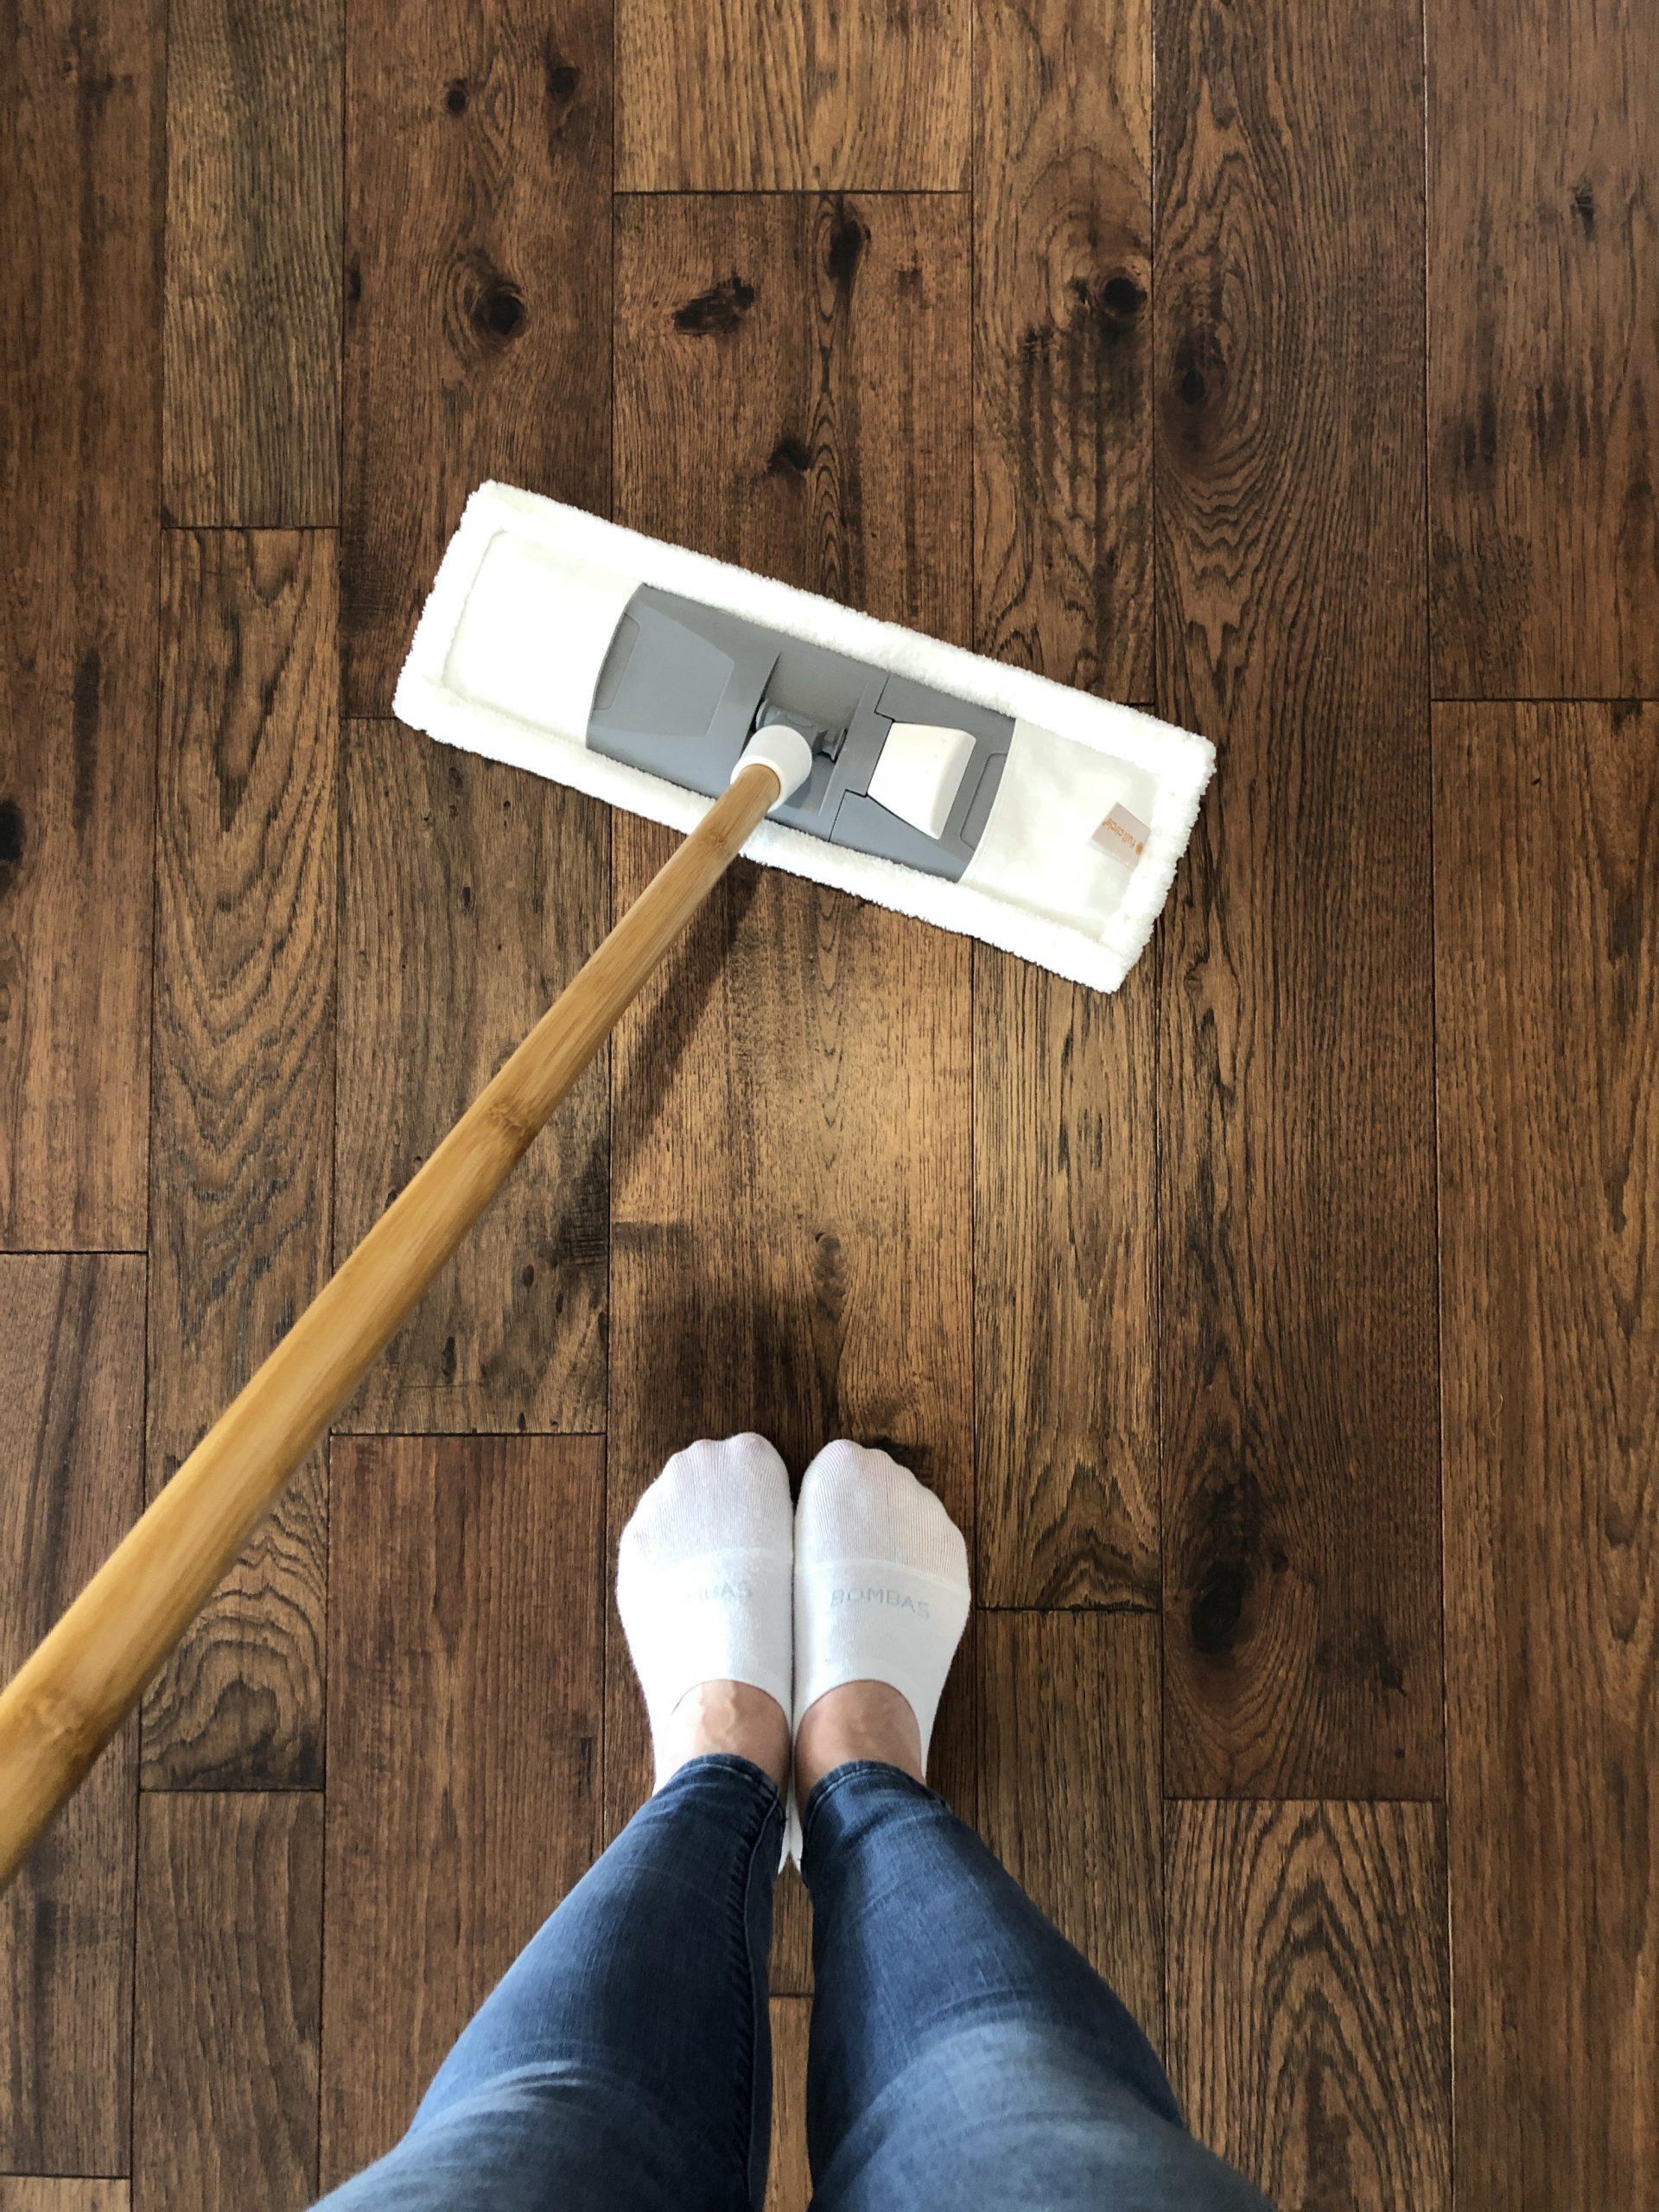 How to Make Vacuuming + Washing Floors Easier – Clean Mama